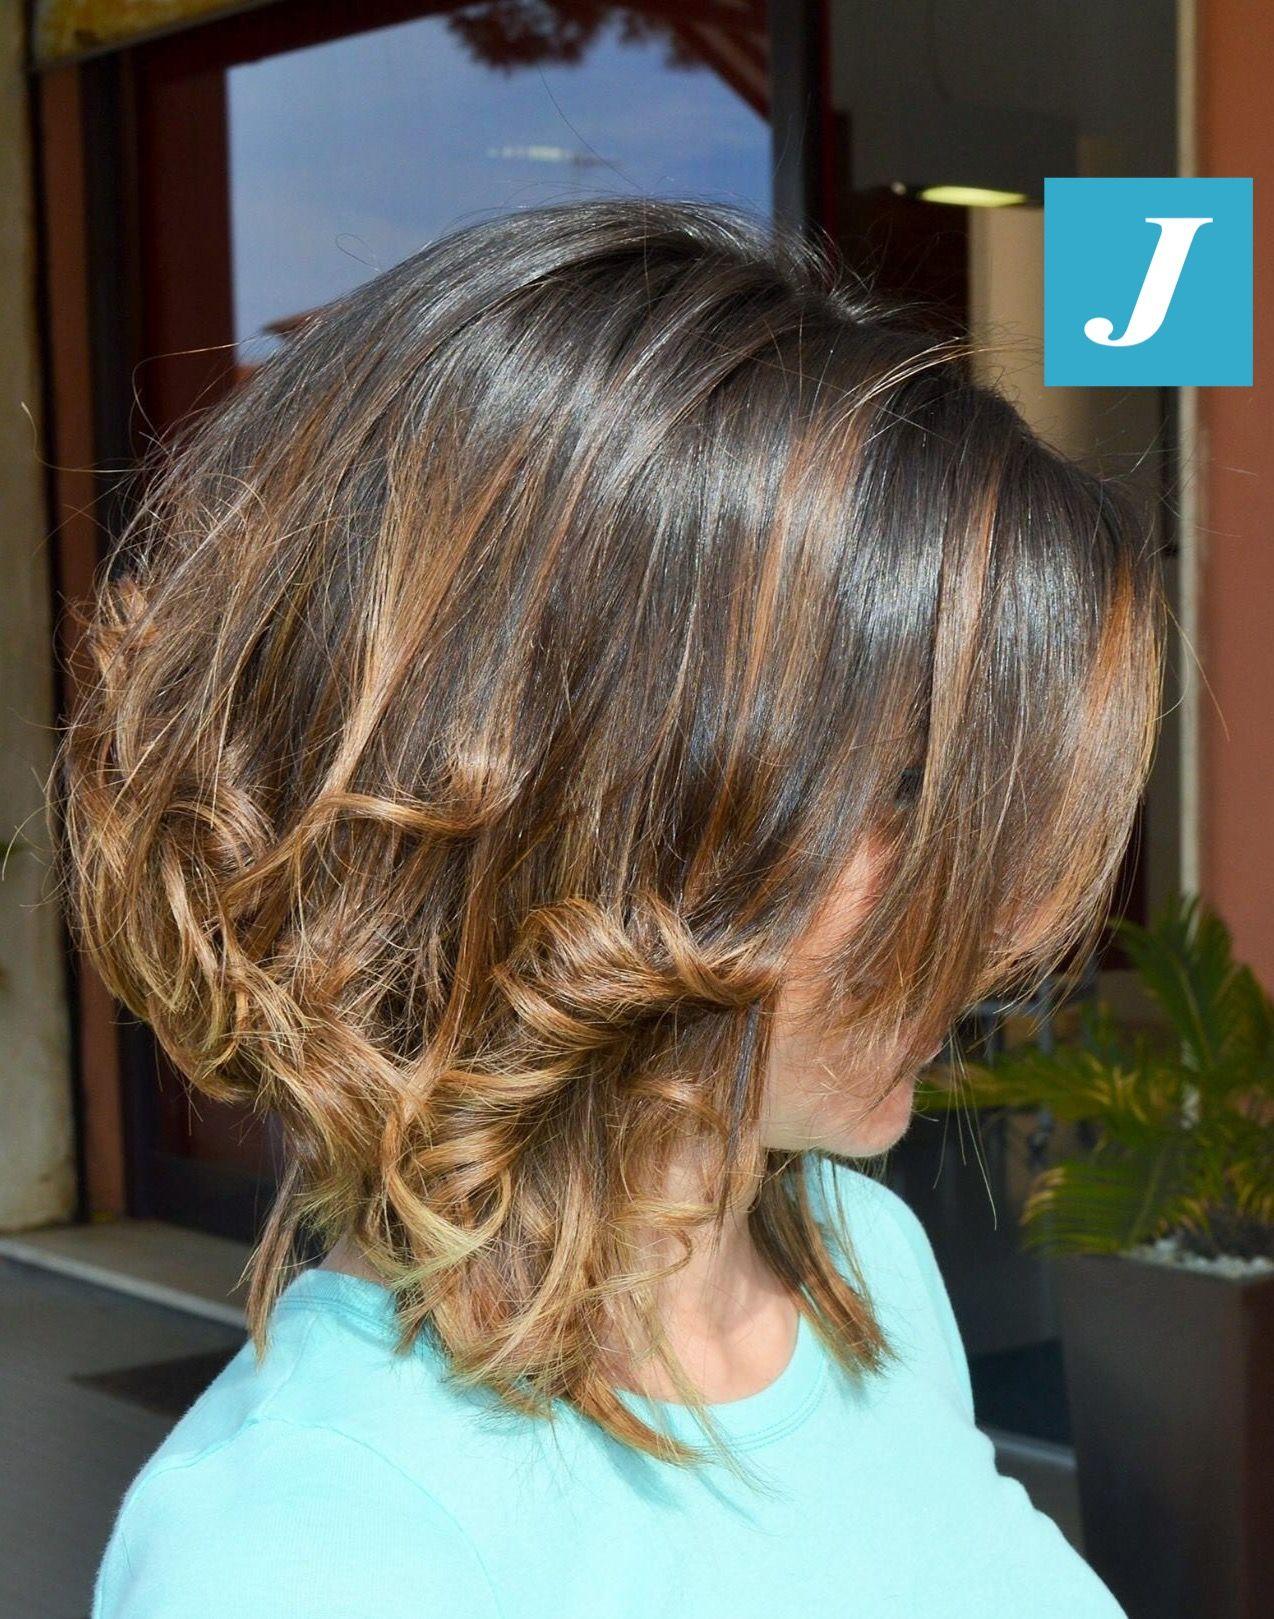 Le originali sfumature del Degradé Joelle abbinate alla leggerezza del Taglio Punte Aria.  #cdj #degradejoelle #tagliopuntearia #degradé #igers #naturalshades #hair #hairstyle #haircolour #haircut #longhair #style #hairfashion